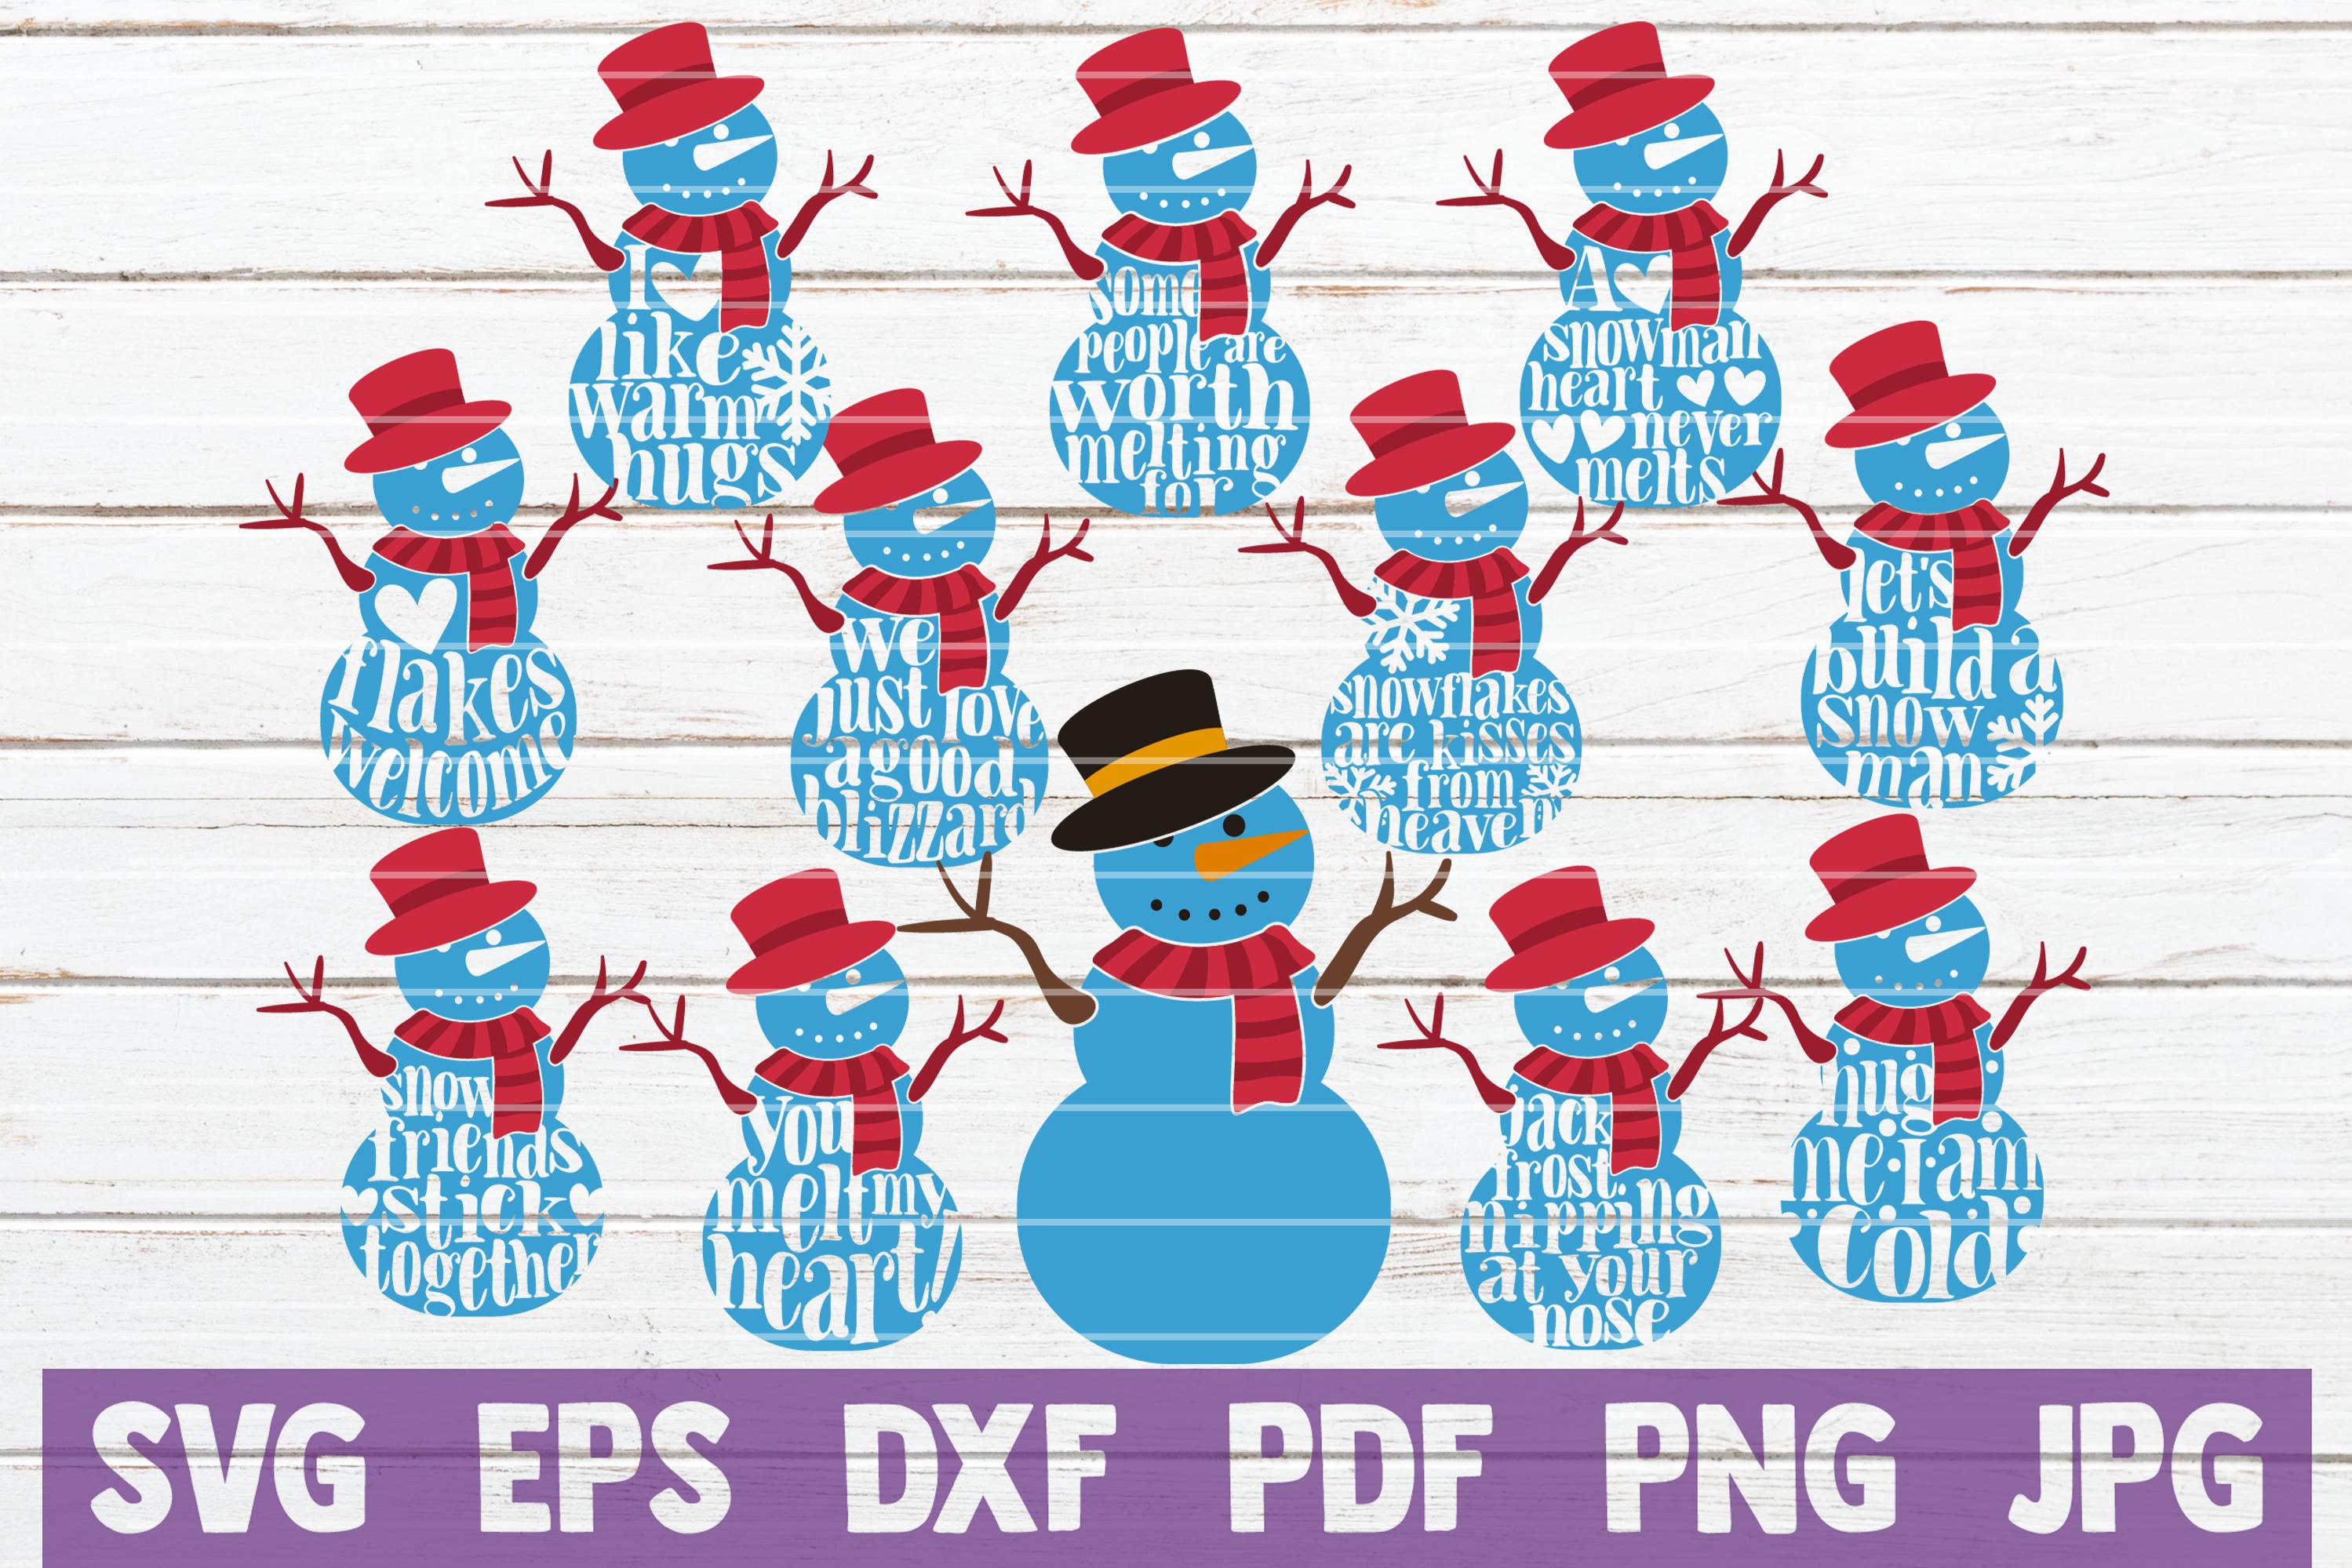 HUGE Christmas SVG Bundle |100 Holiday Designs SVG Cut Files example image 5